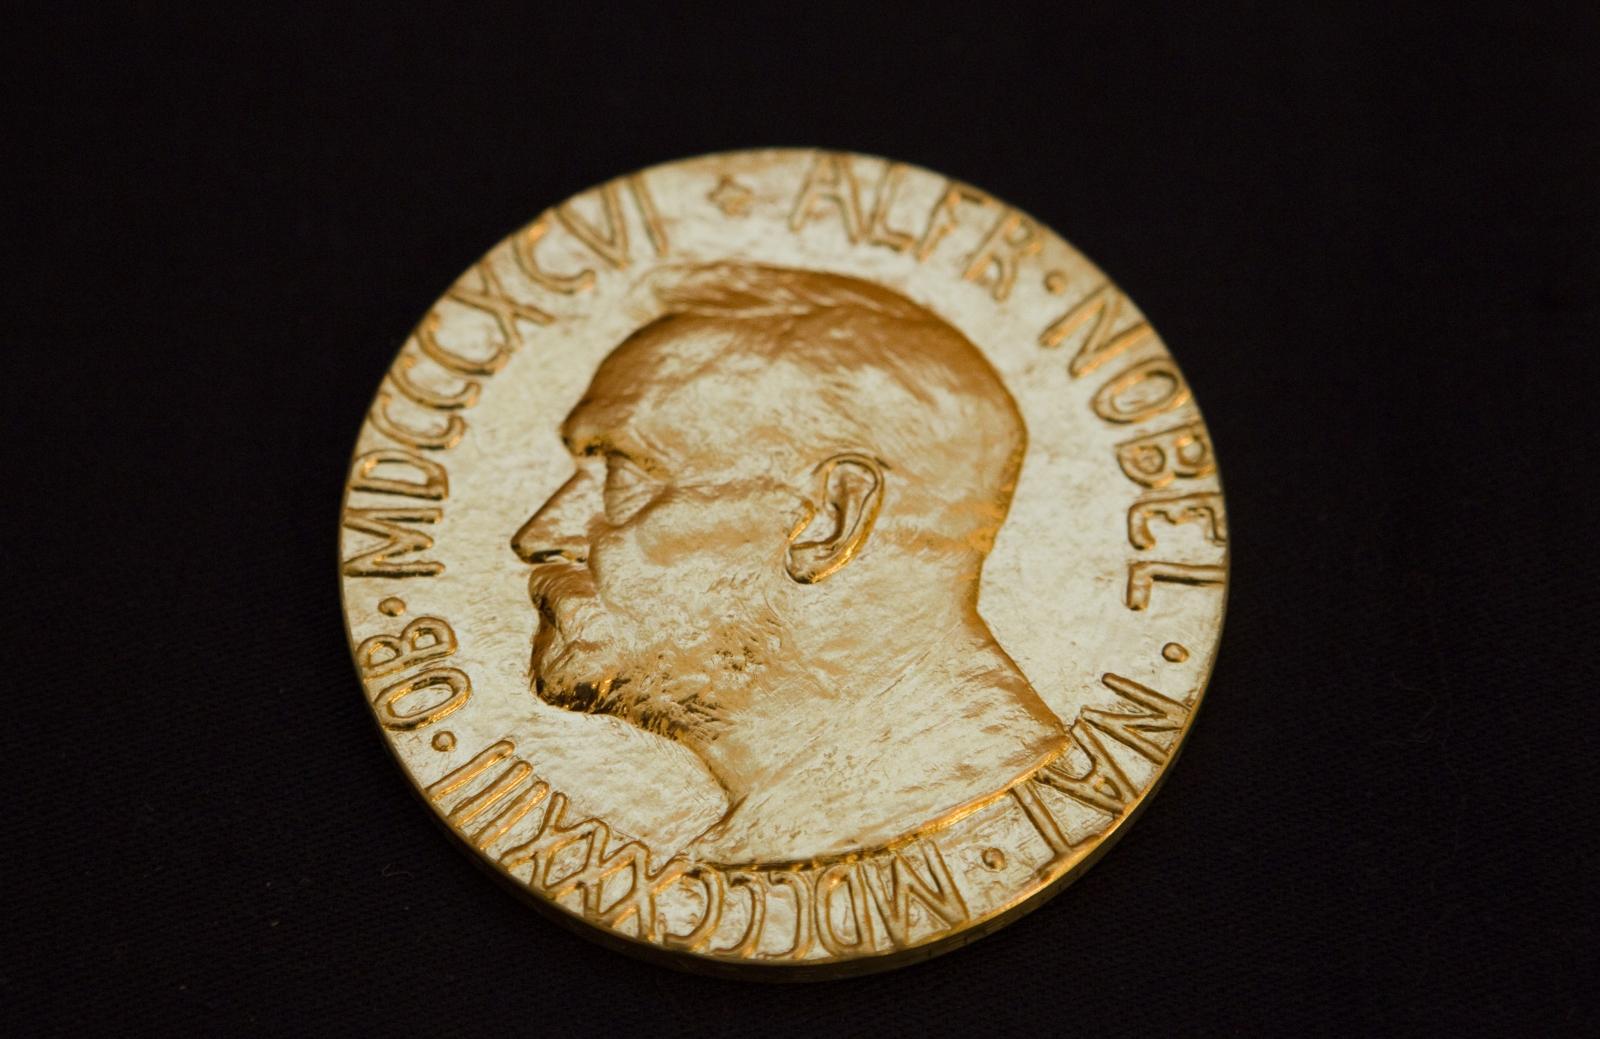 Nobel Peace Prize 2010